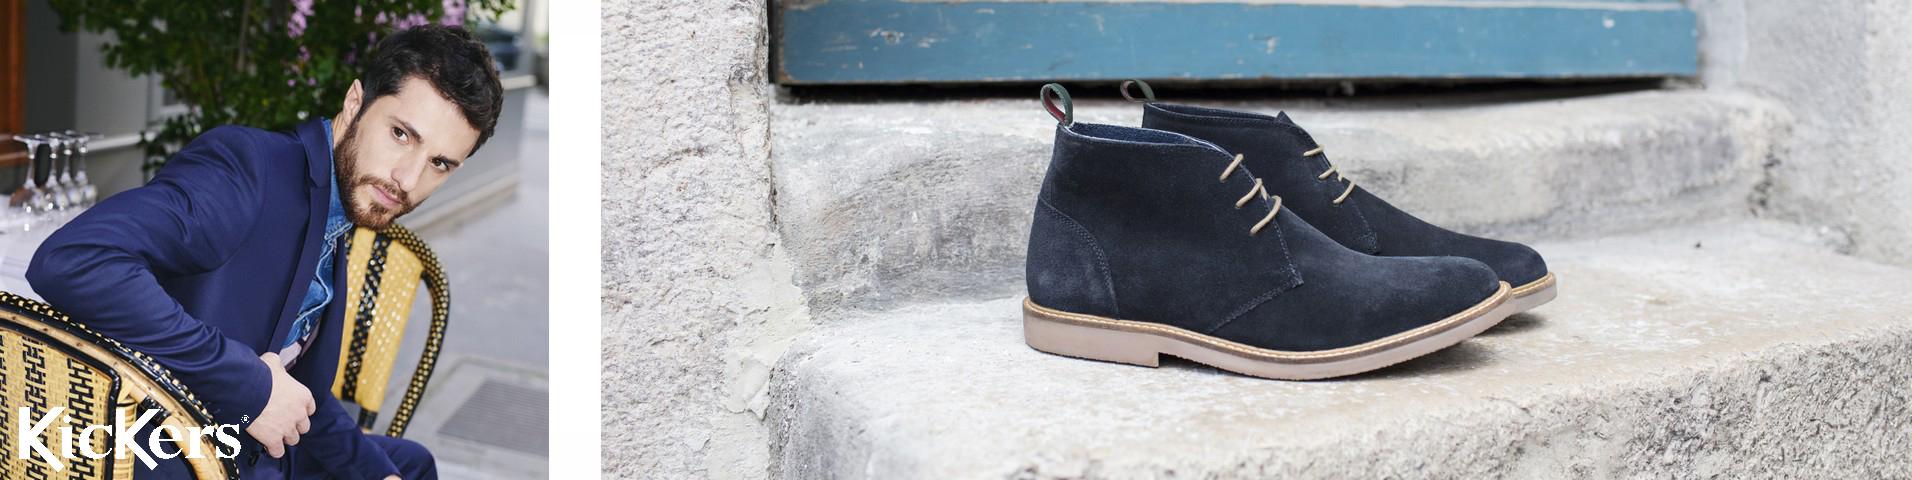 Kickers Herresko | Køb dine nye sko til herrer online hos